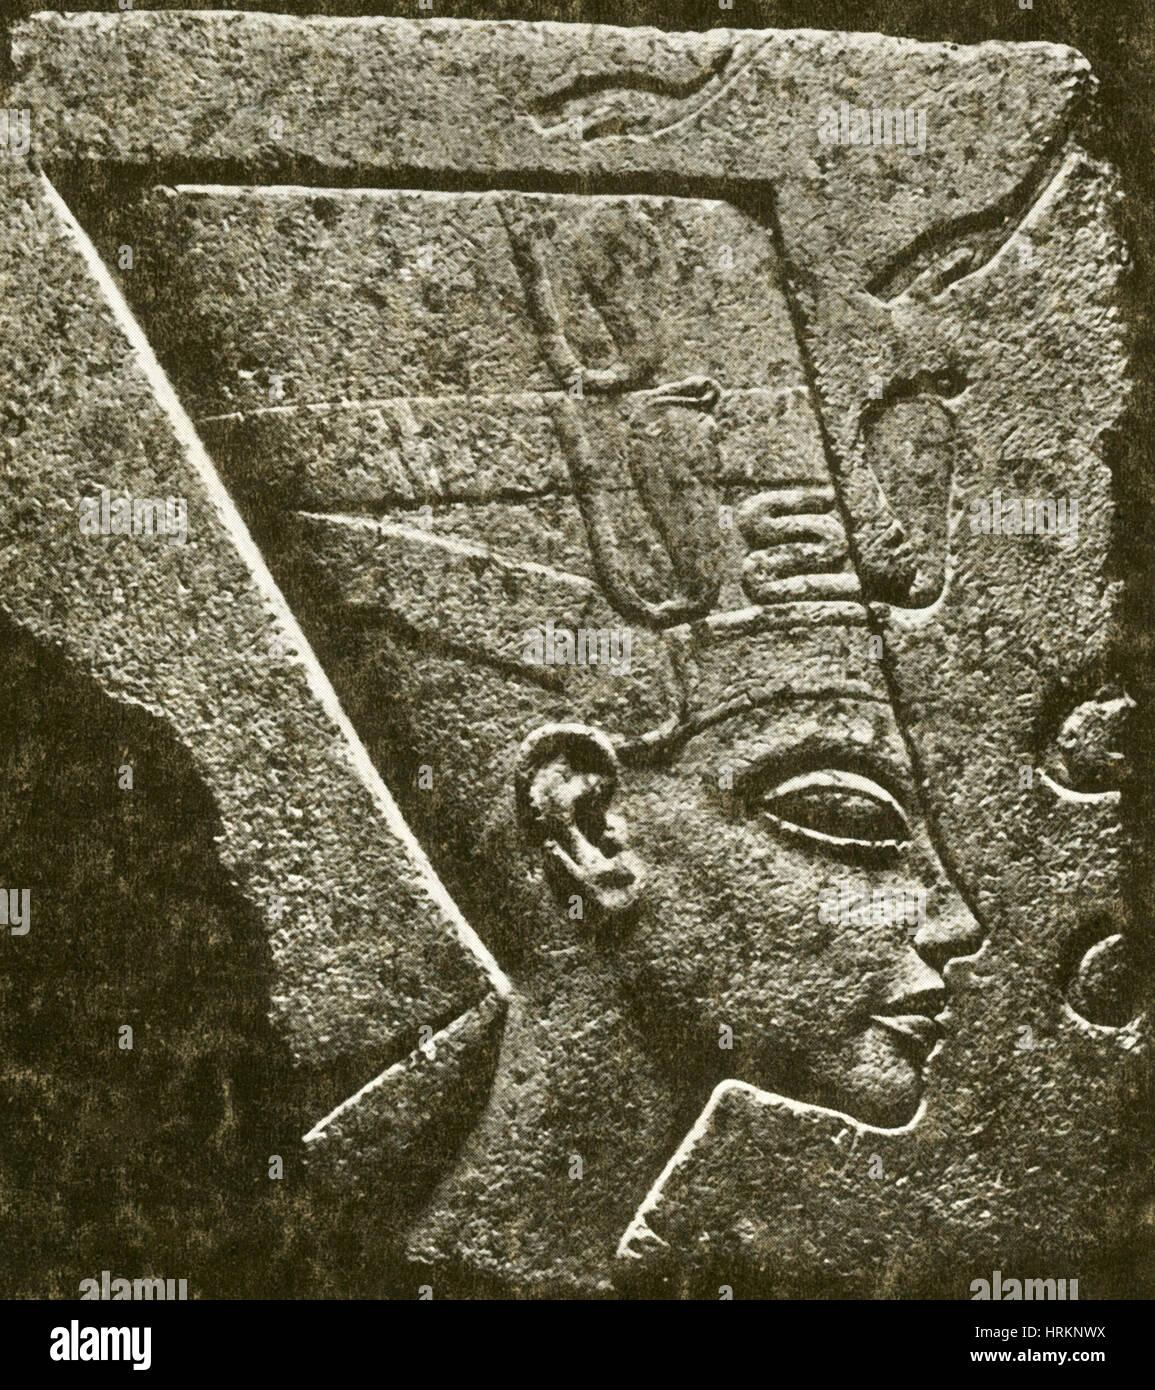 Nefertiti, Ancient Egyptian Queen - Stock Image